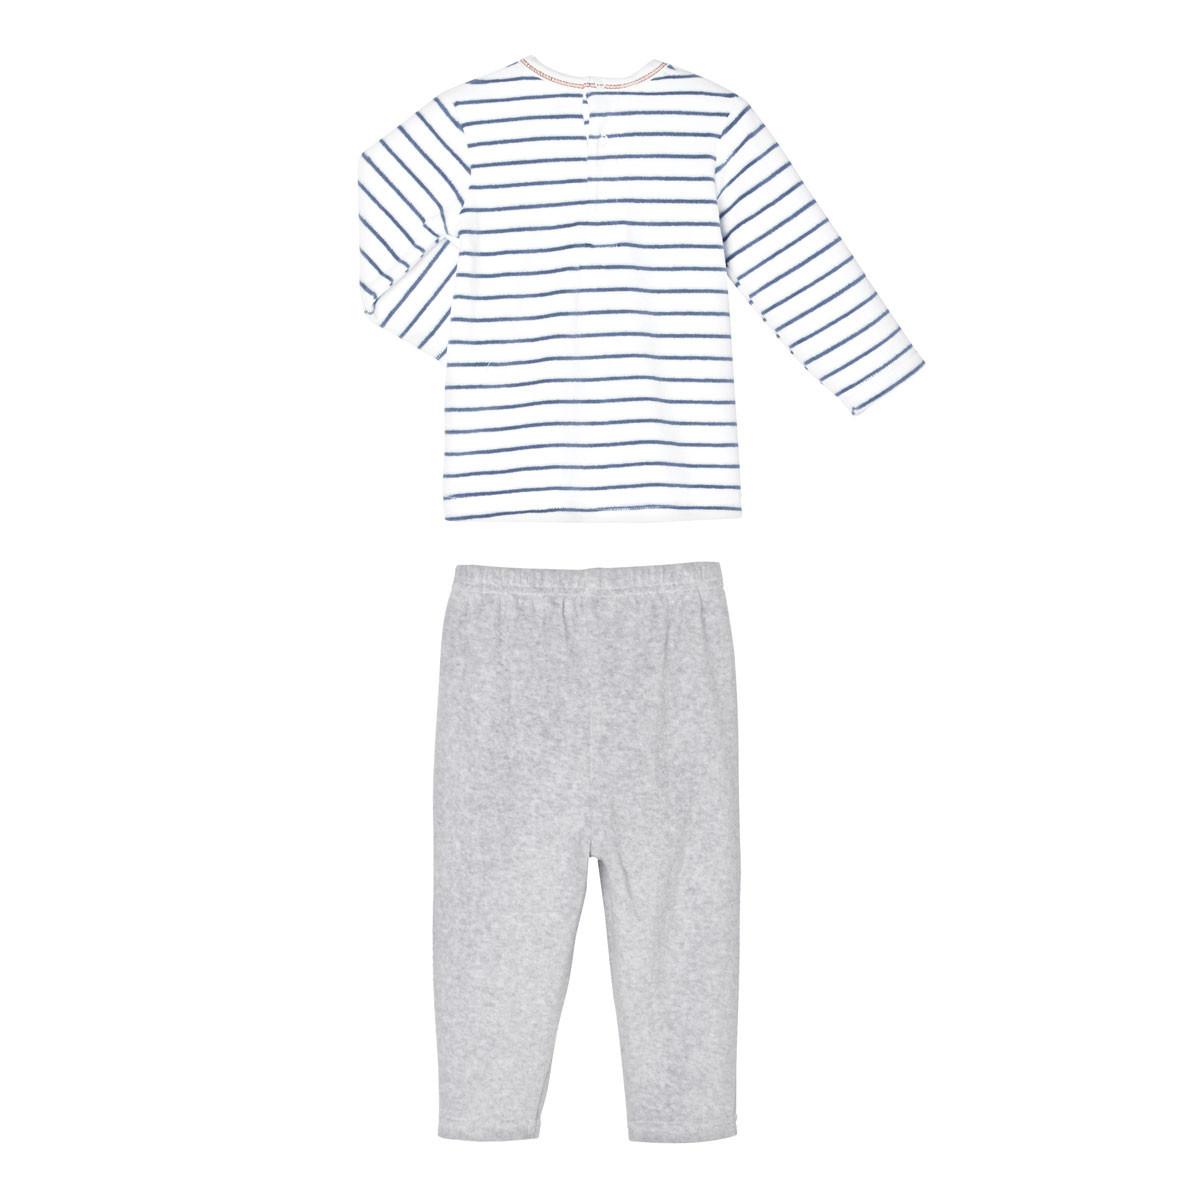 Pyjama bébé 2 pièces velours Oh My Dog dos